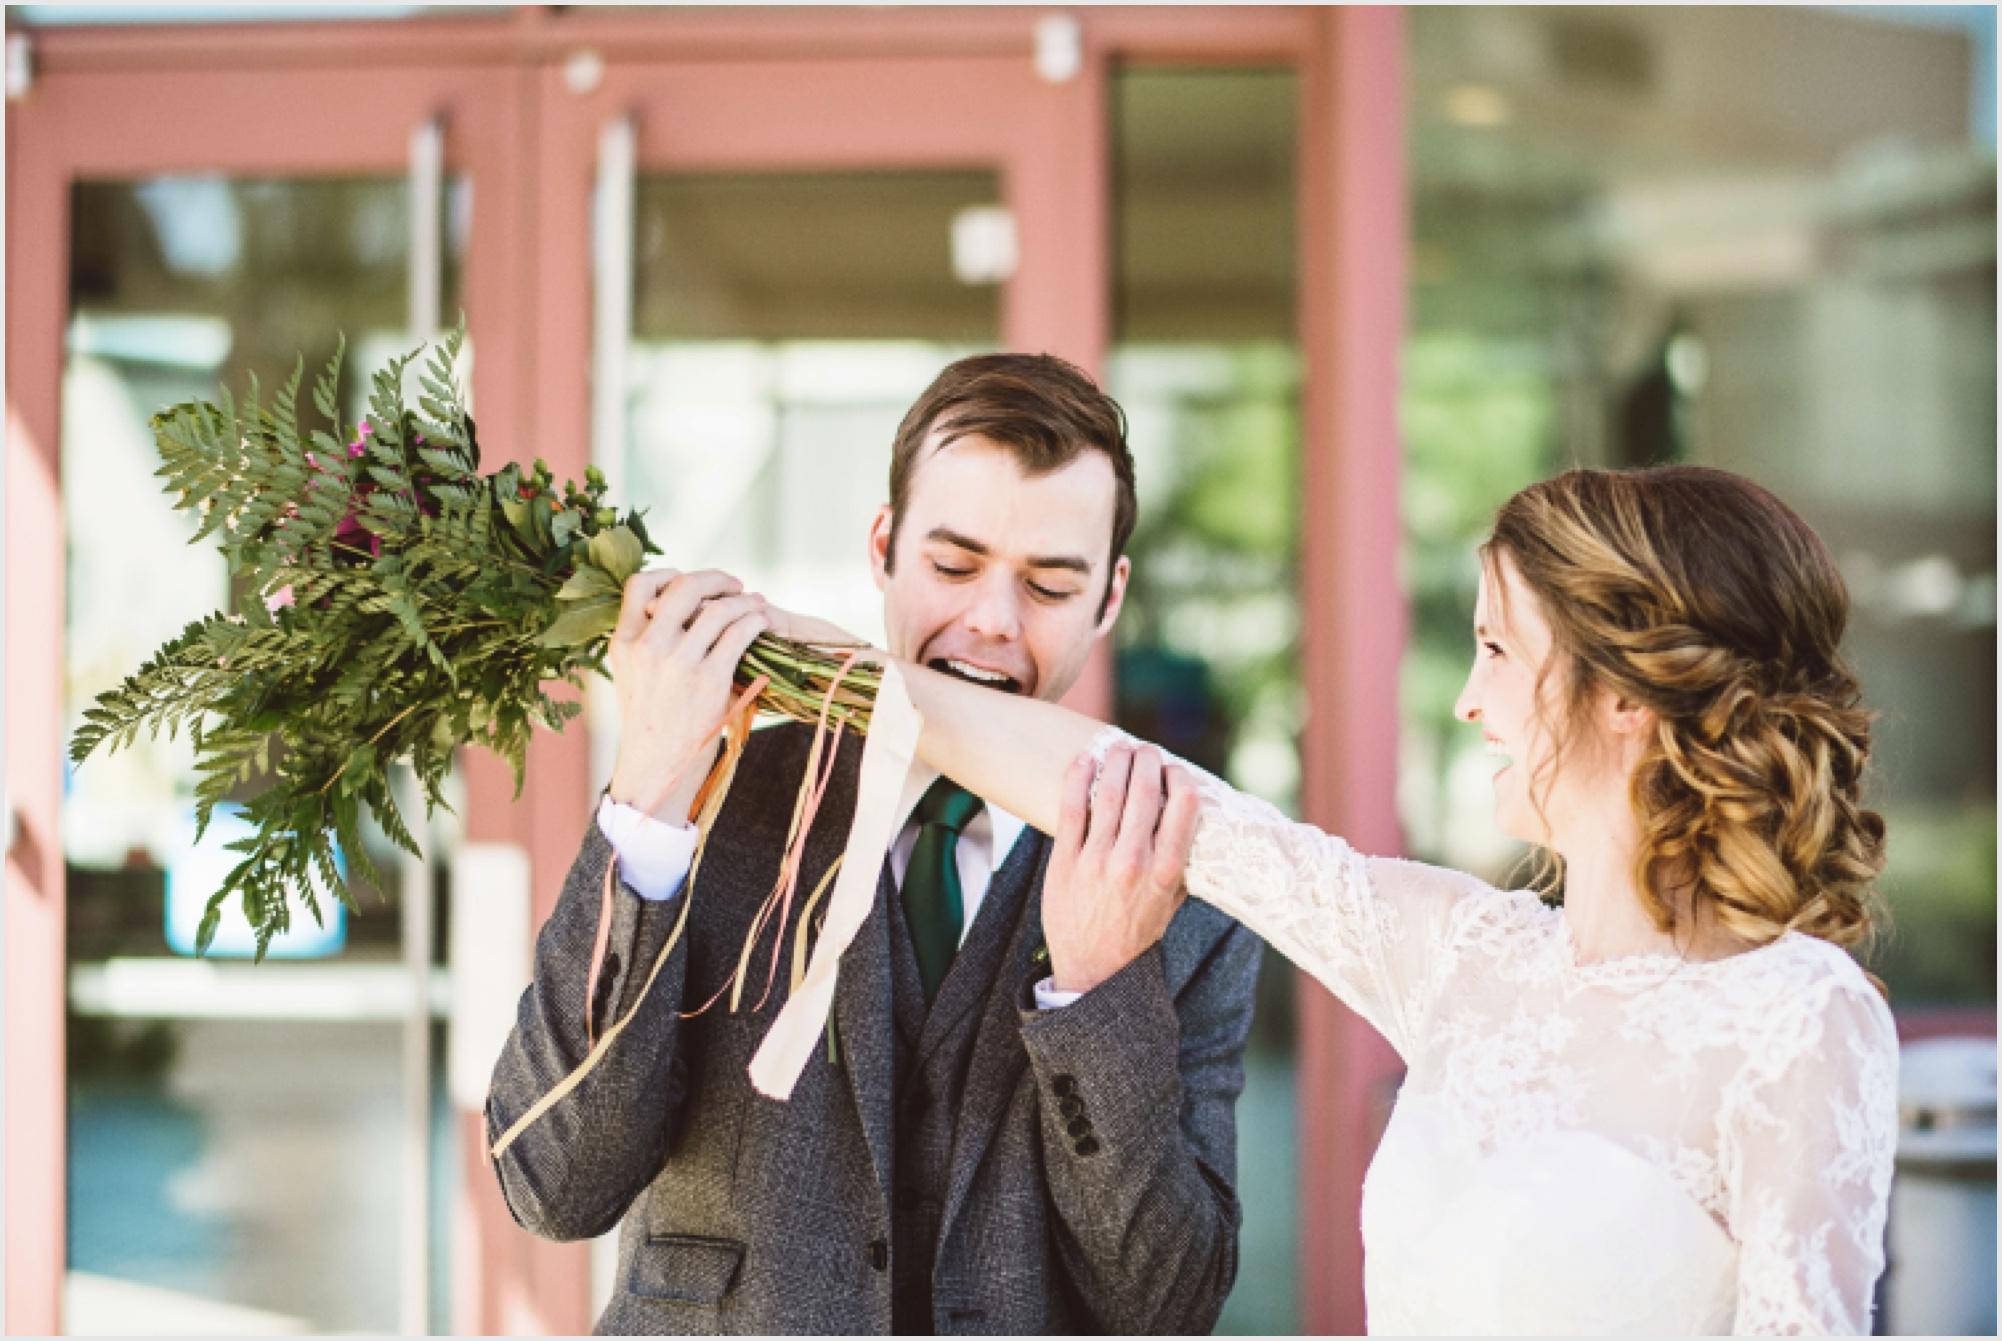 abby_taylor_minneapolis_wedding_lucas_botz_photography_151.jpg